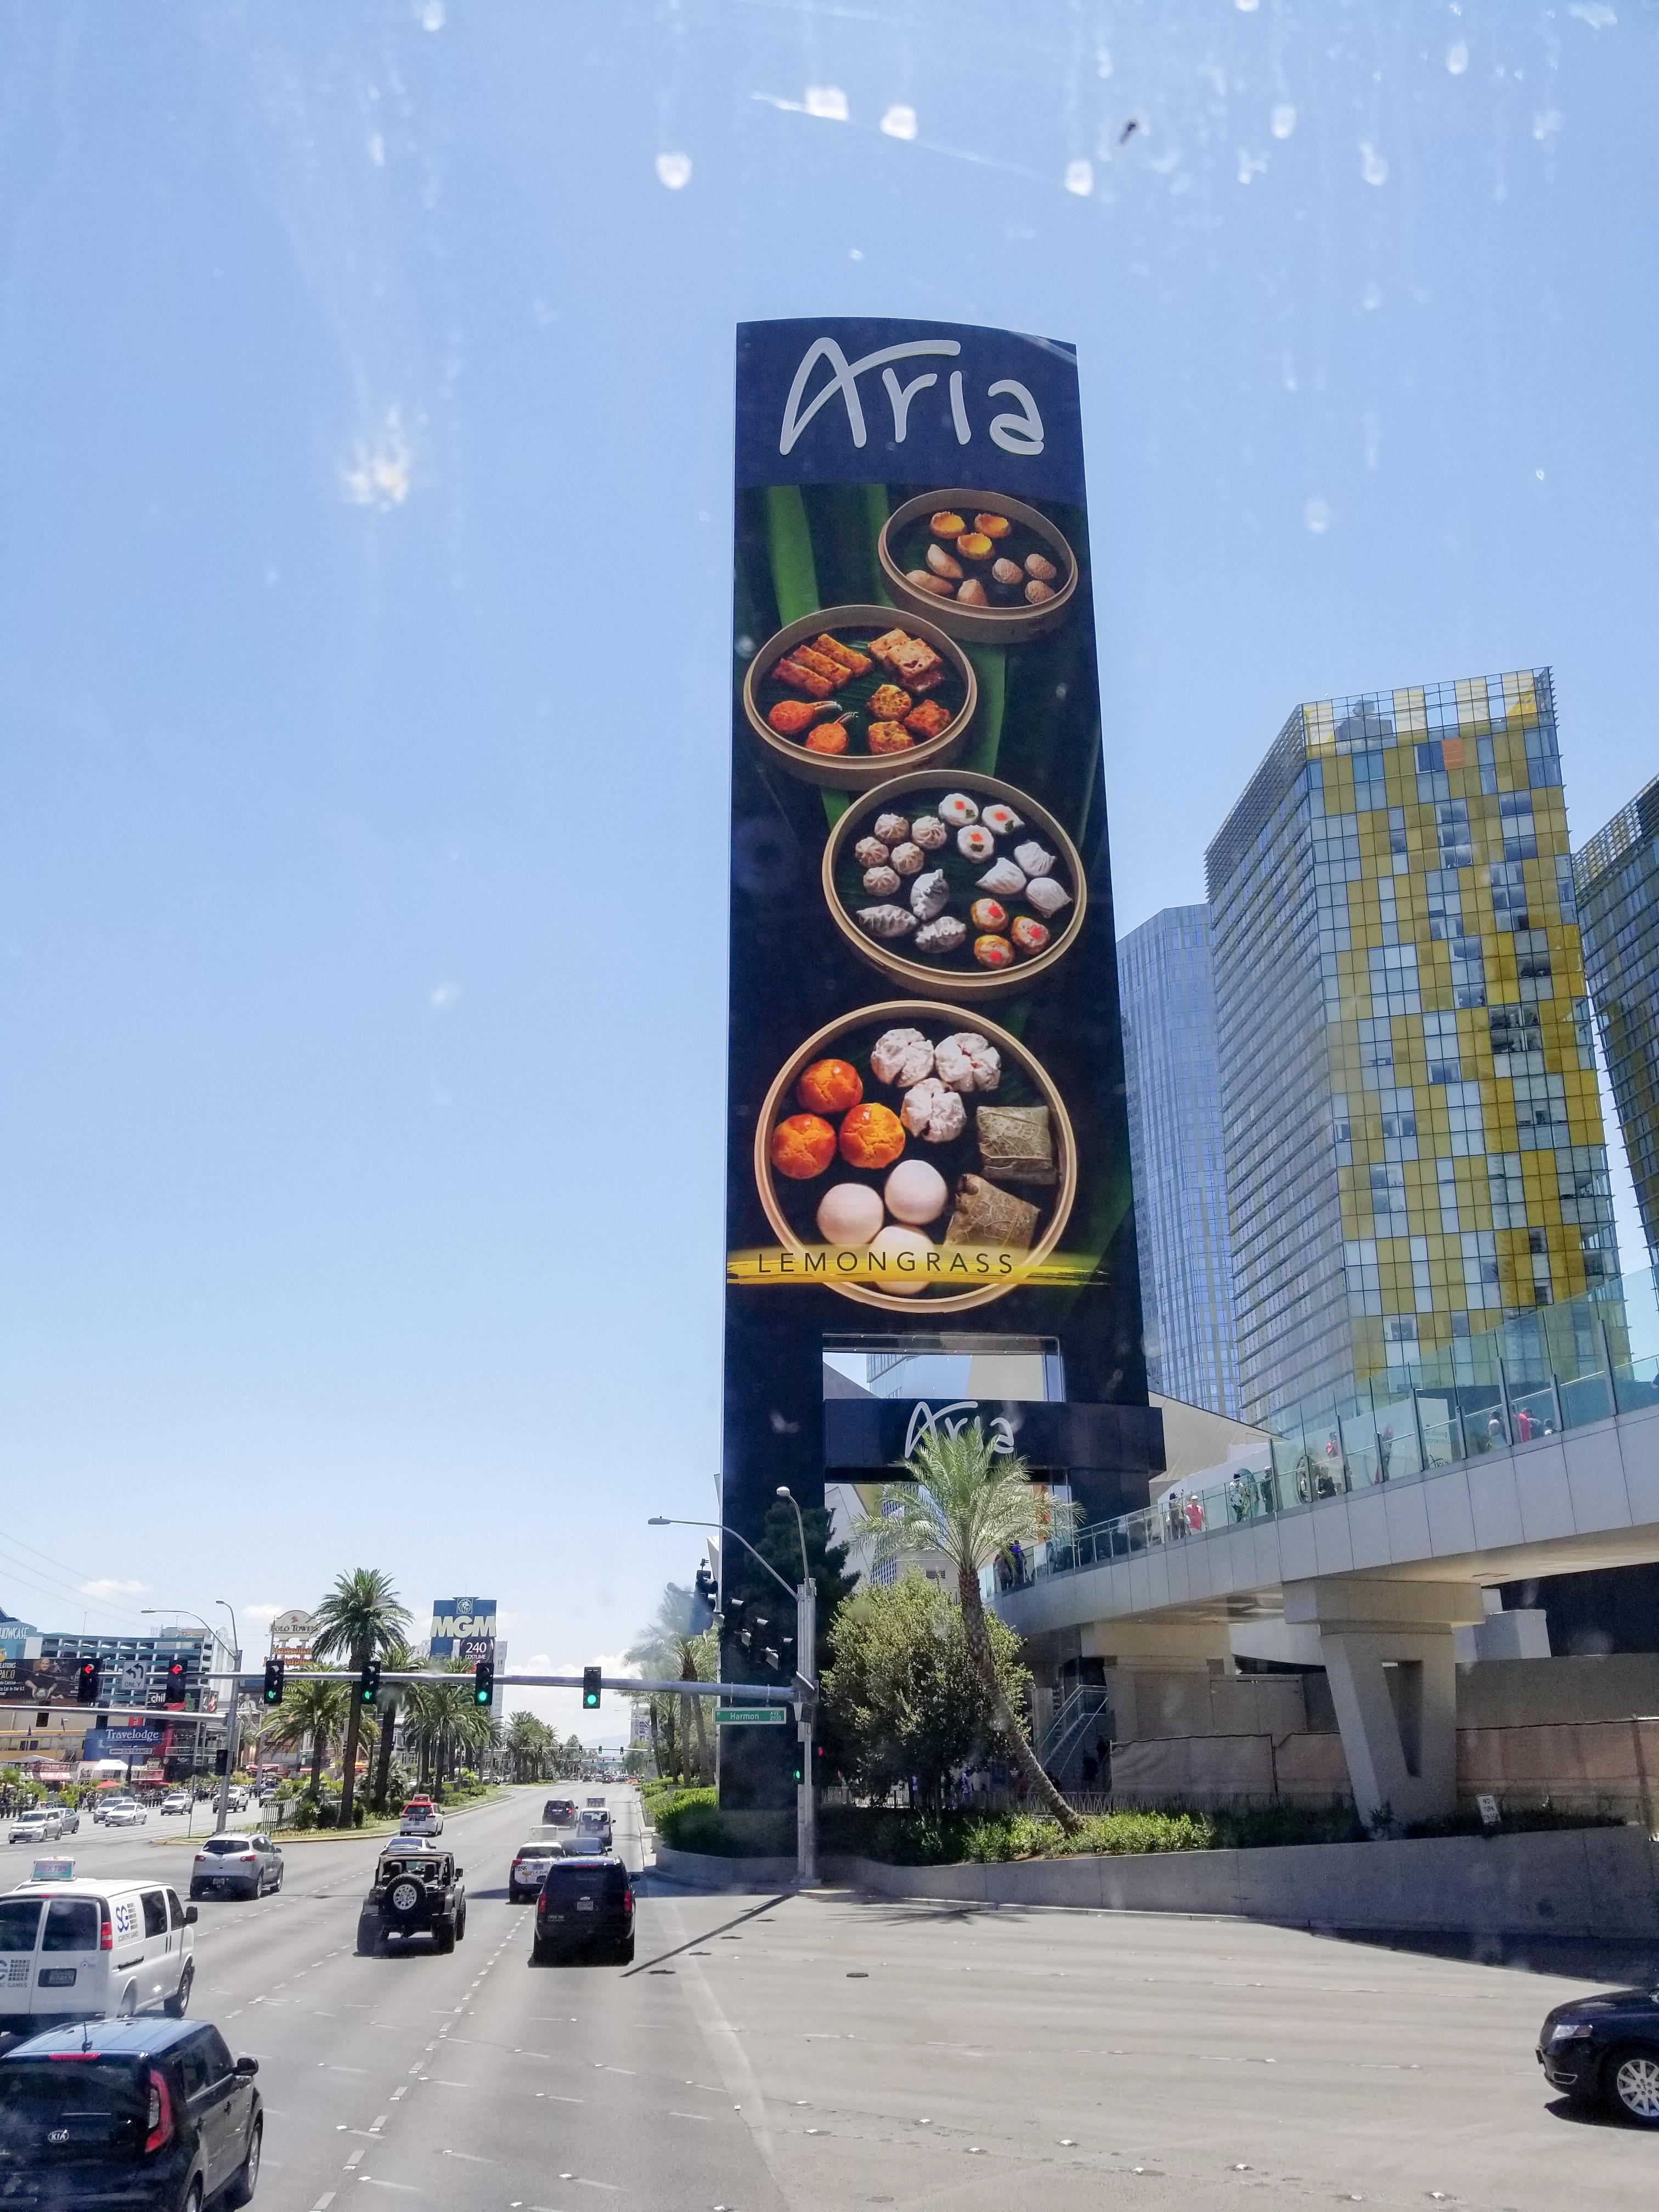 11 March 2019 English Aria casino LCD screen.